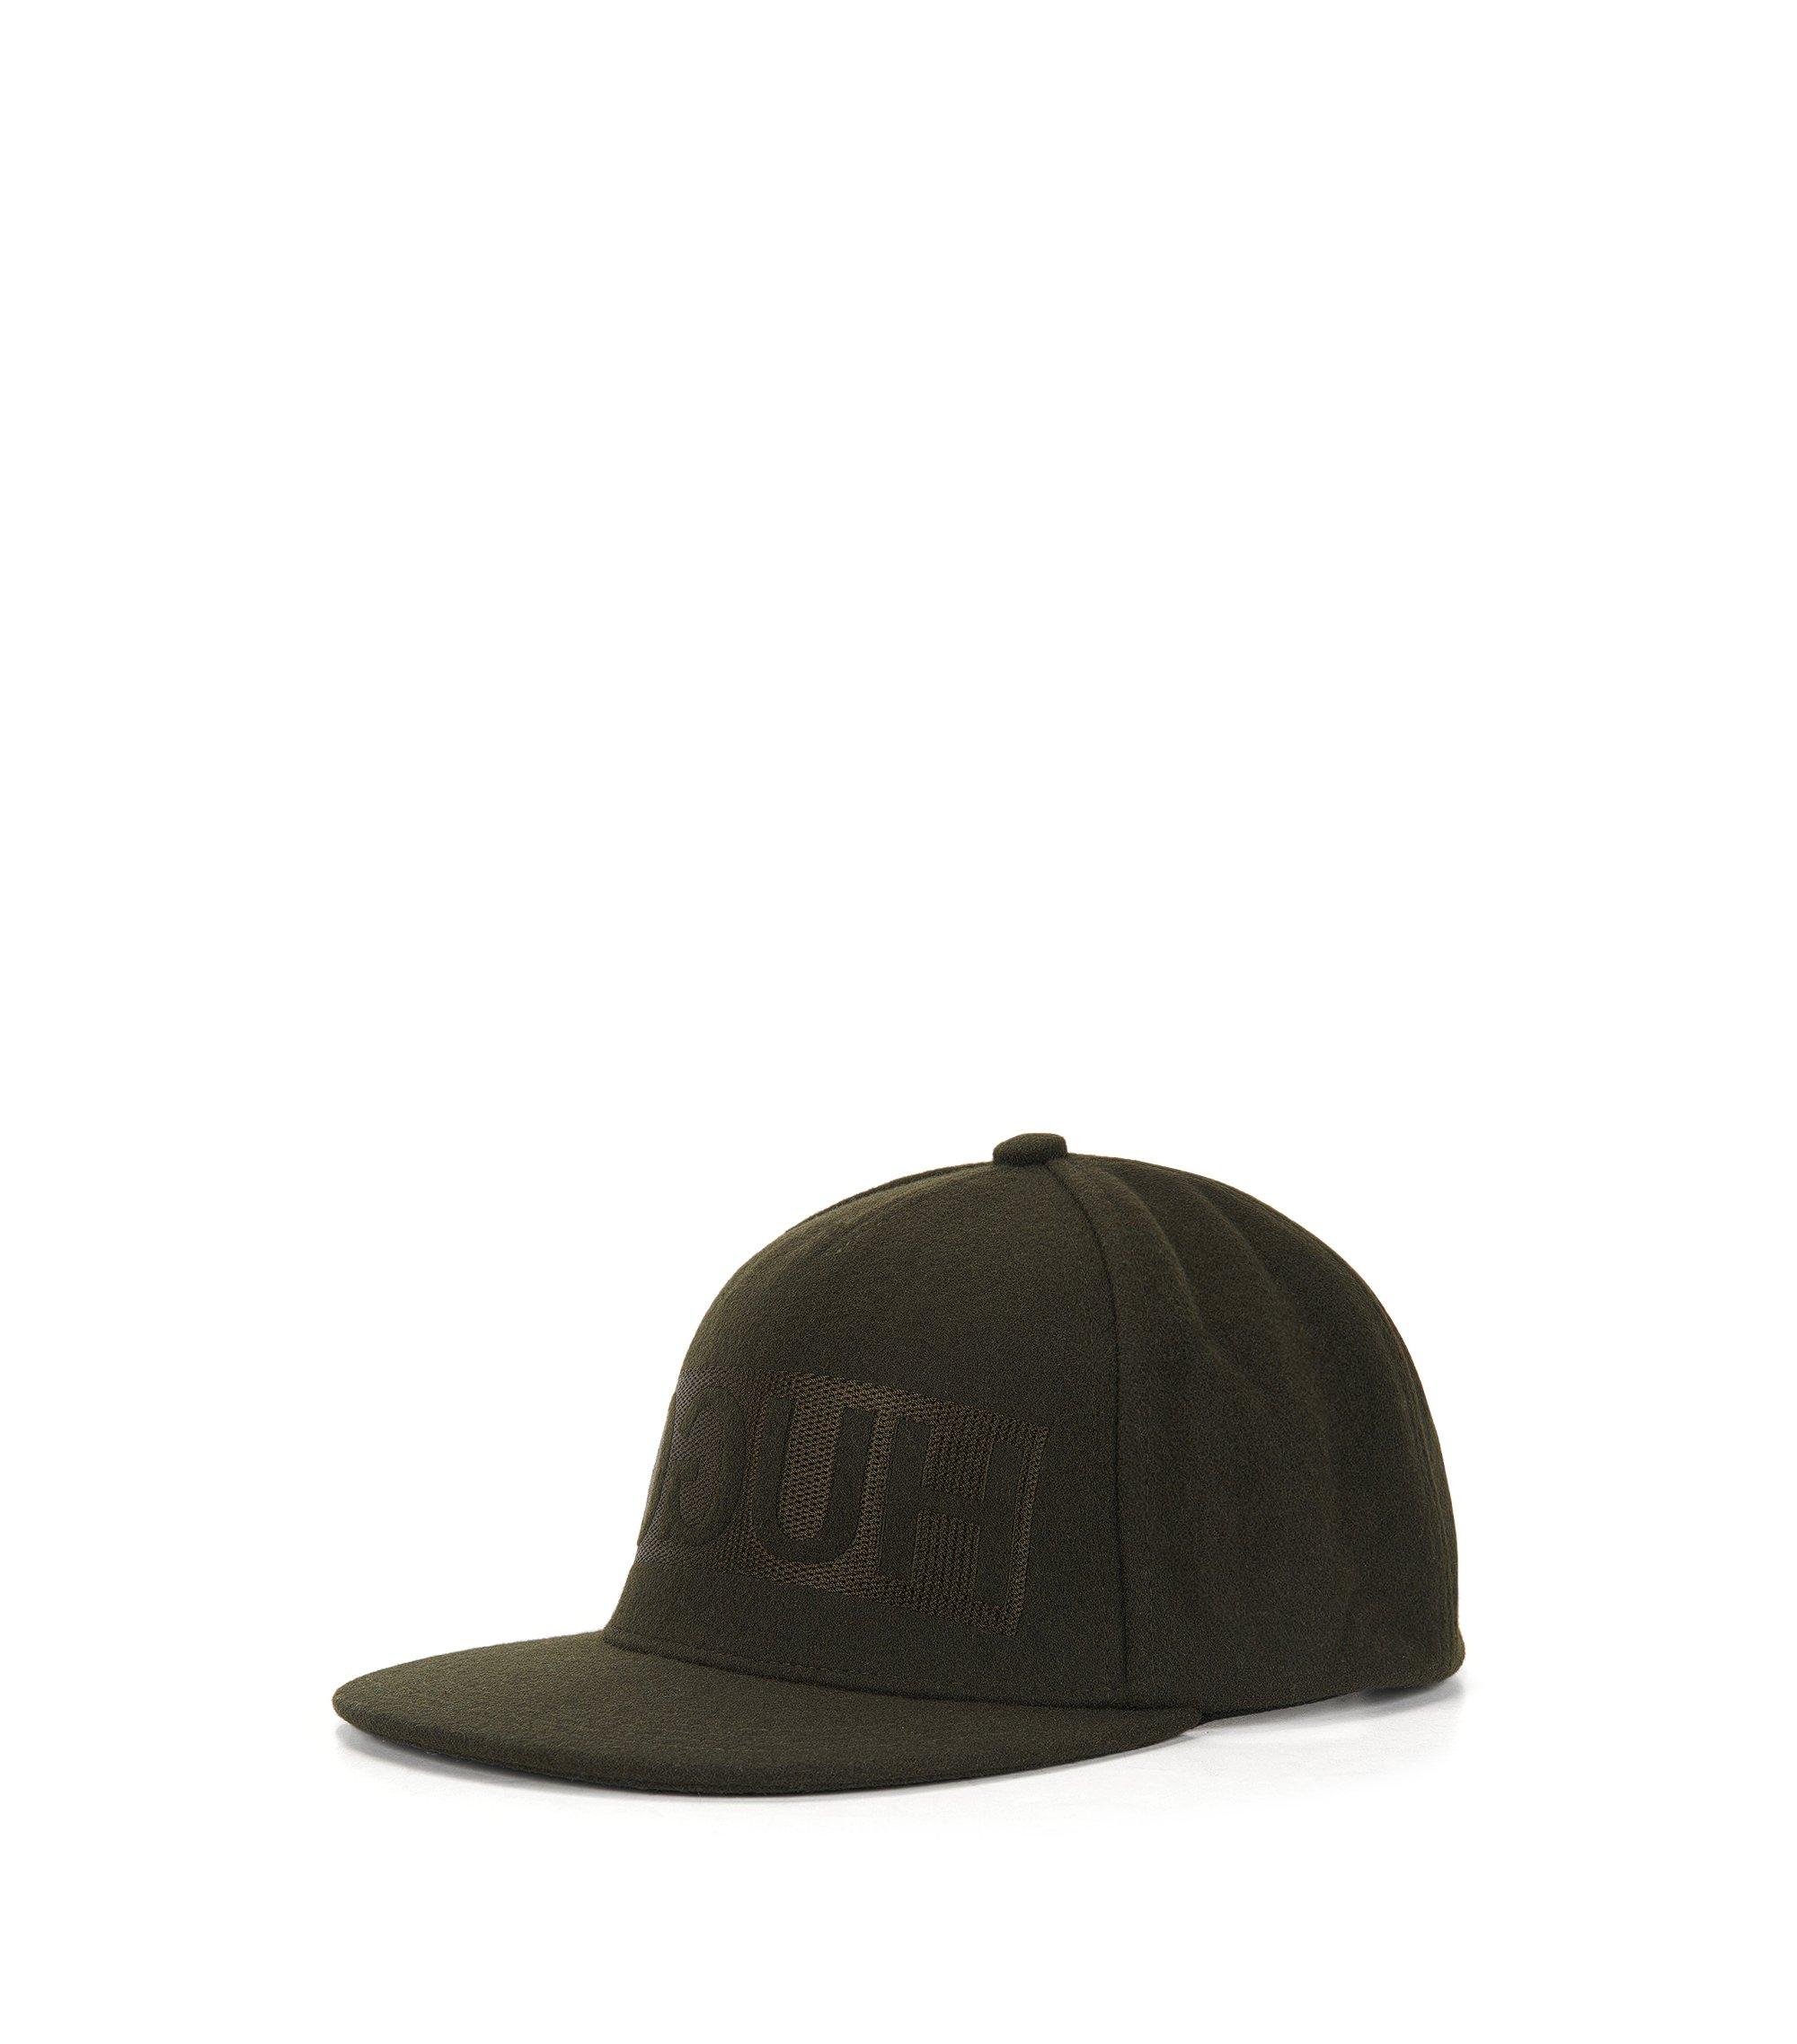 Cappellino da baseball in feltro di lana con logo a rovescio , Verde scuro